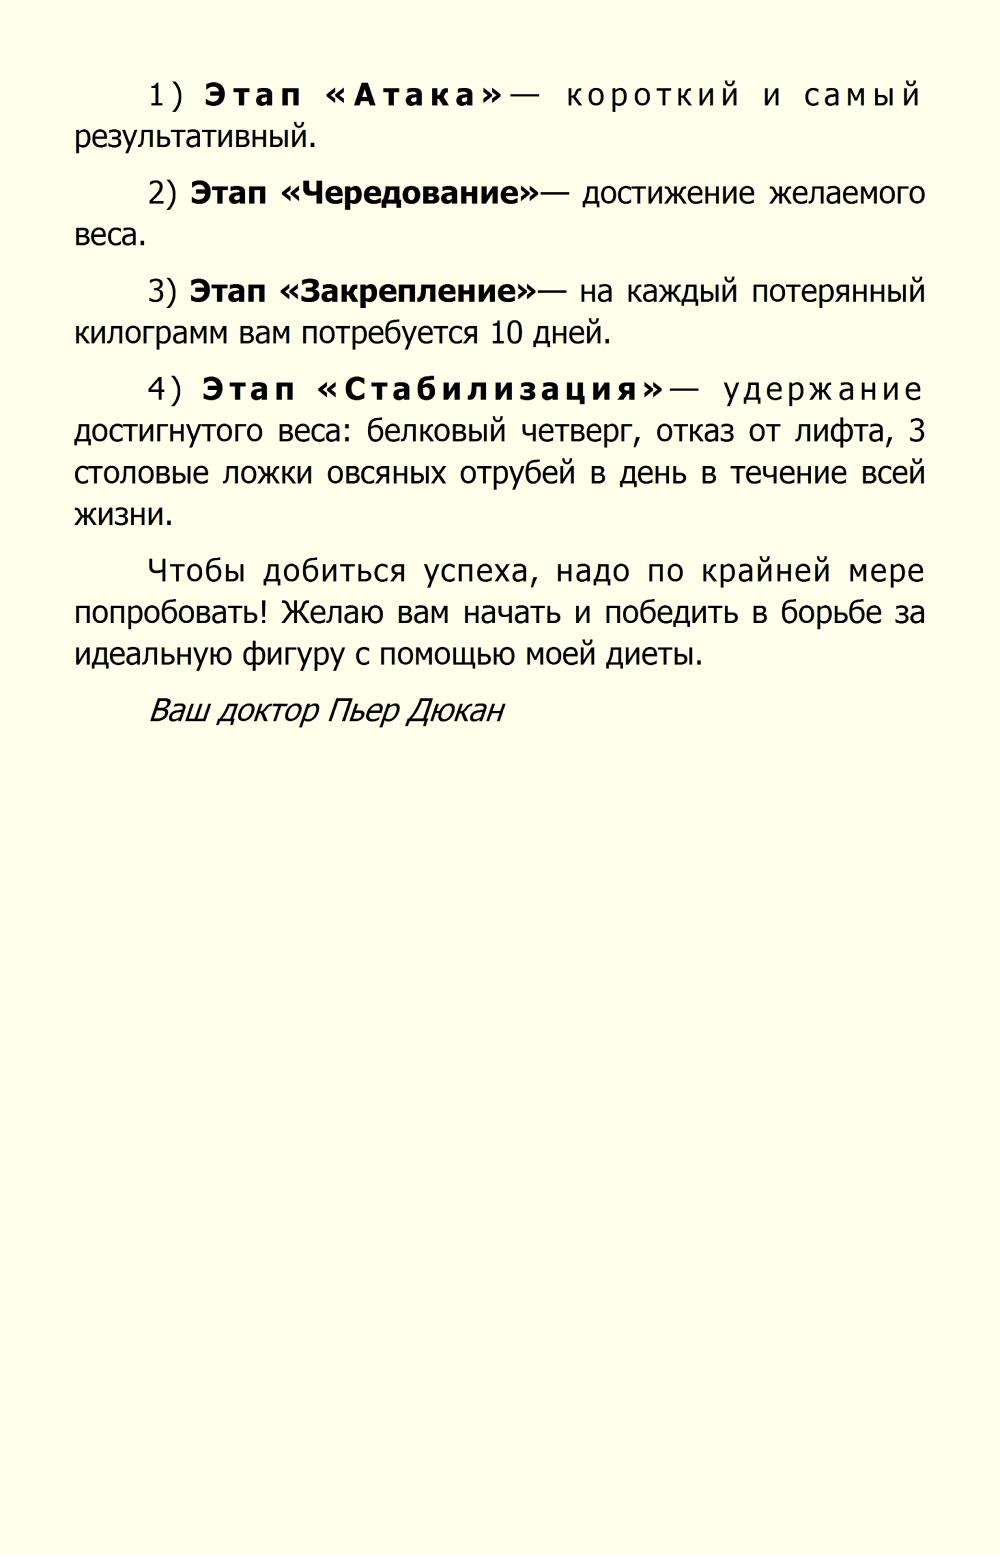 http://i6.imageban.ru/out/2014/01/21/14f13e994a4b3ae6ed4e270f70c8c51c.jpg